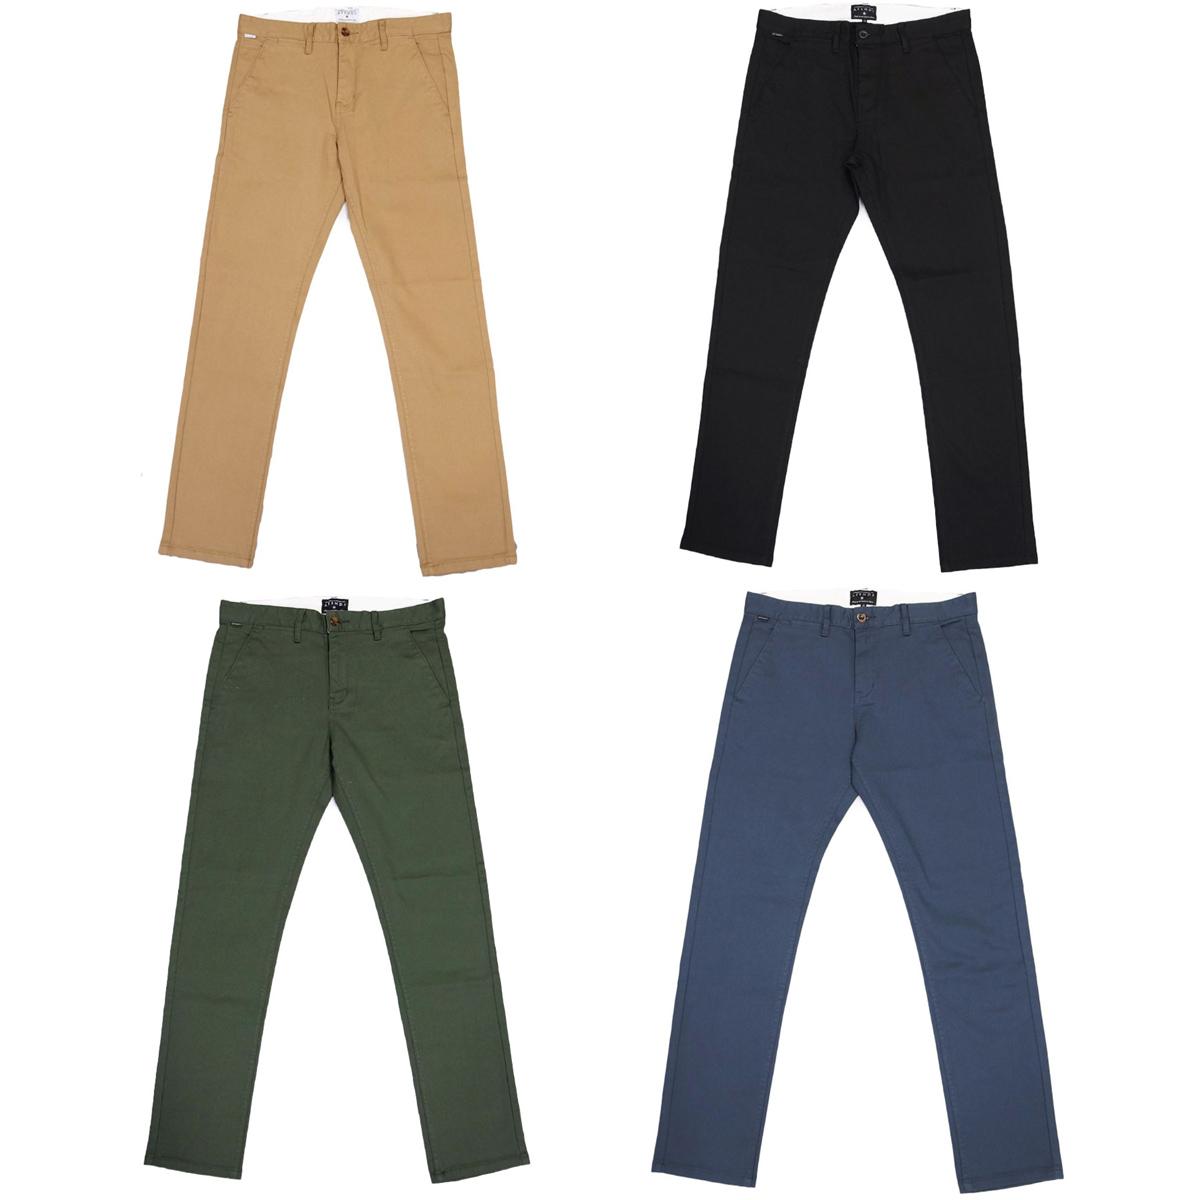 AFENDS アフェンズ RIVAL CHINO PANT 4色 サーフ系 サーフィン メンズ チノパン ストレート ジップフライ メンズ OOO